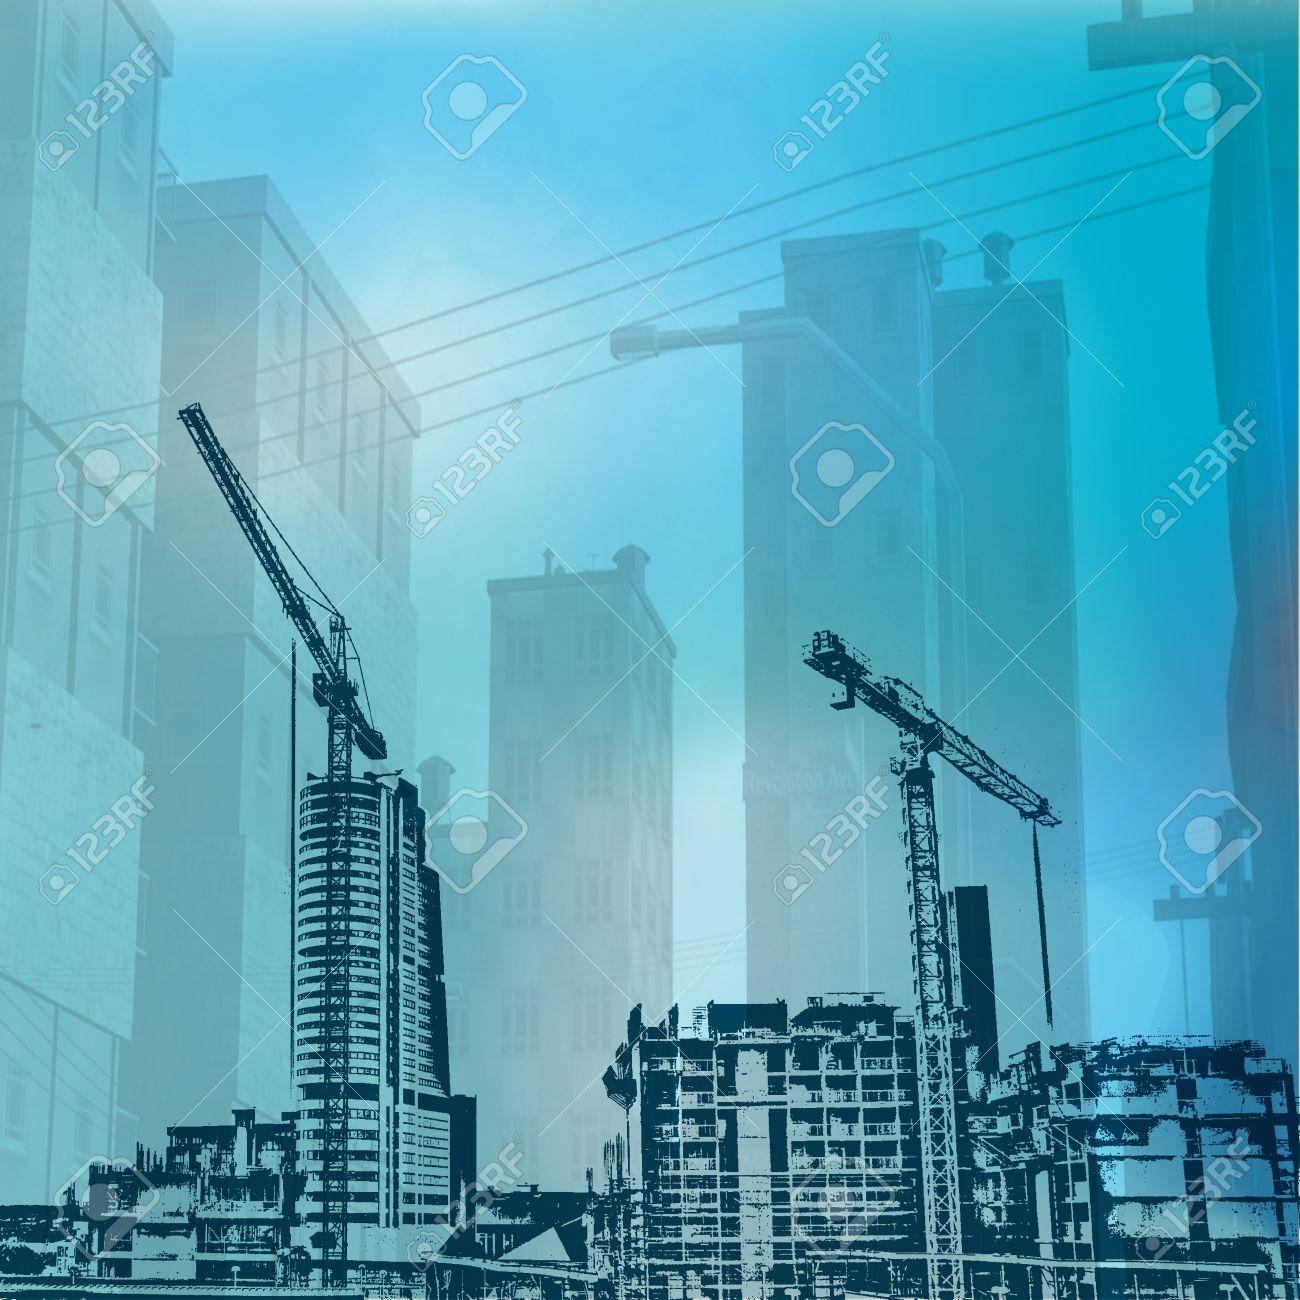 Urban Construction Background Stock Photo - 9081198